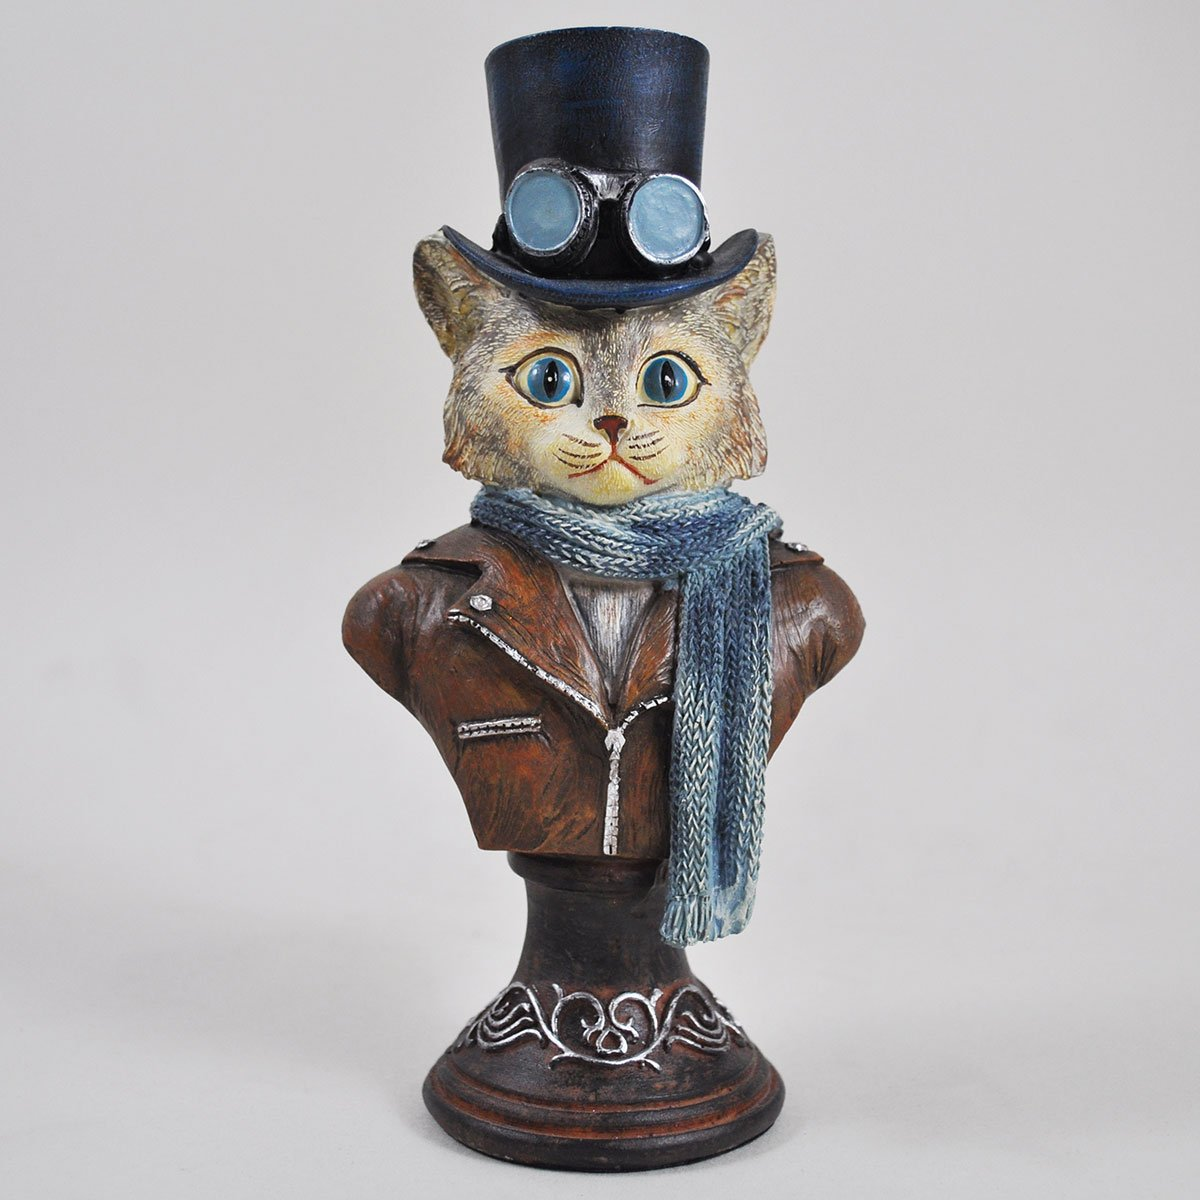 Dapper Animal Steampunk Cat Bust Alternative Novelty Decor Anthropomorphic H18cm Fiesta Studios